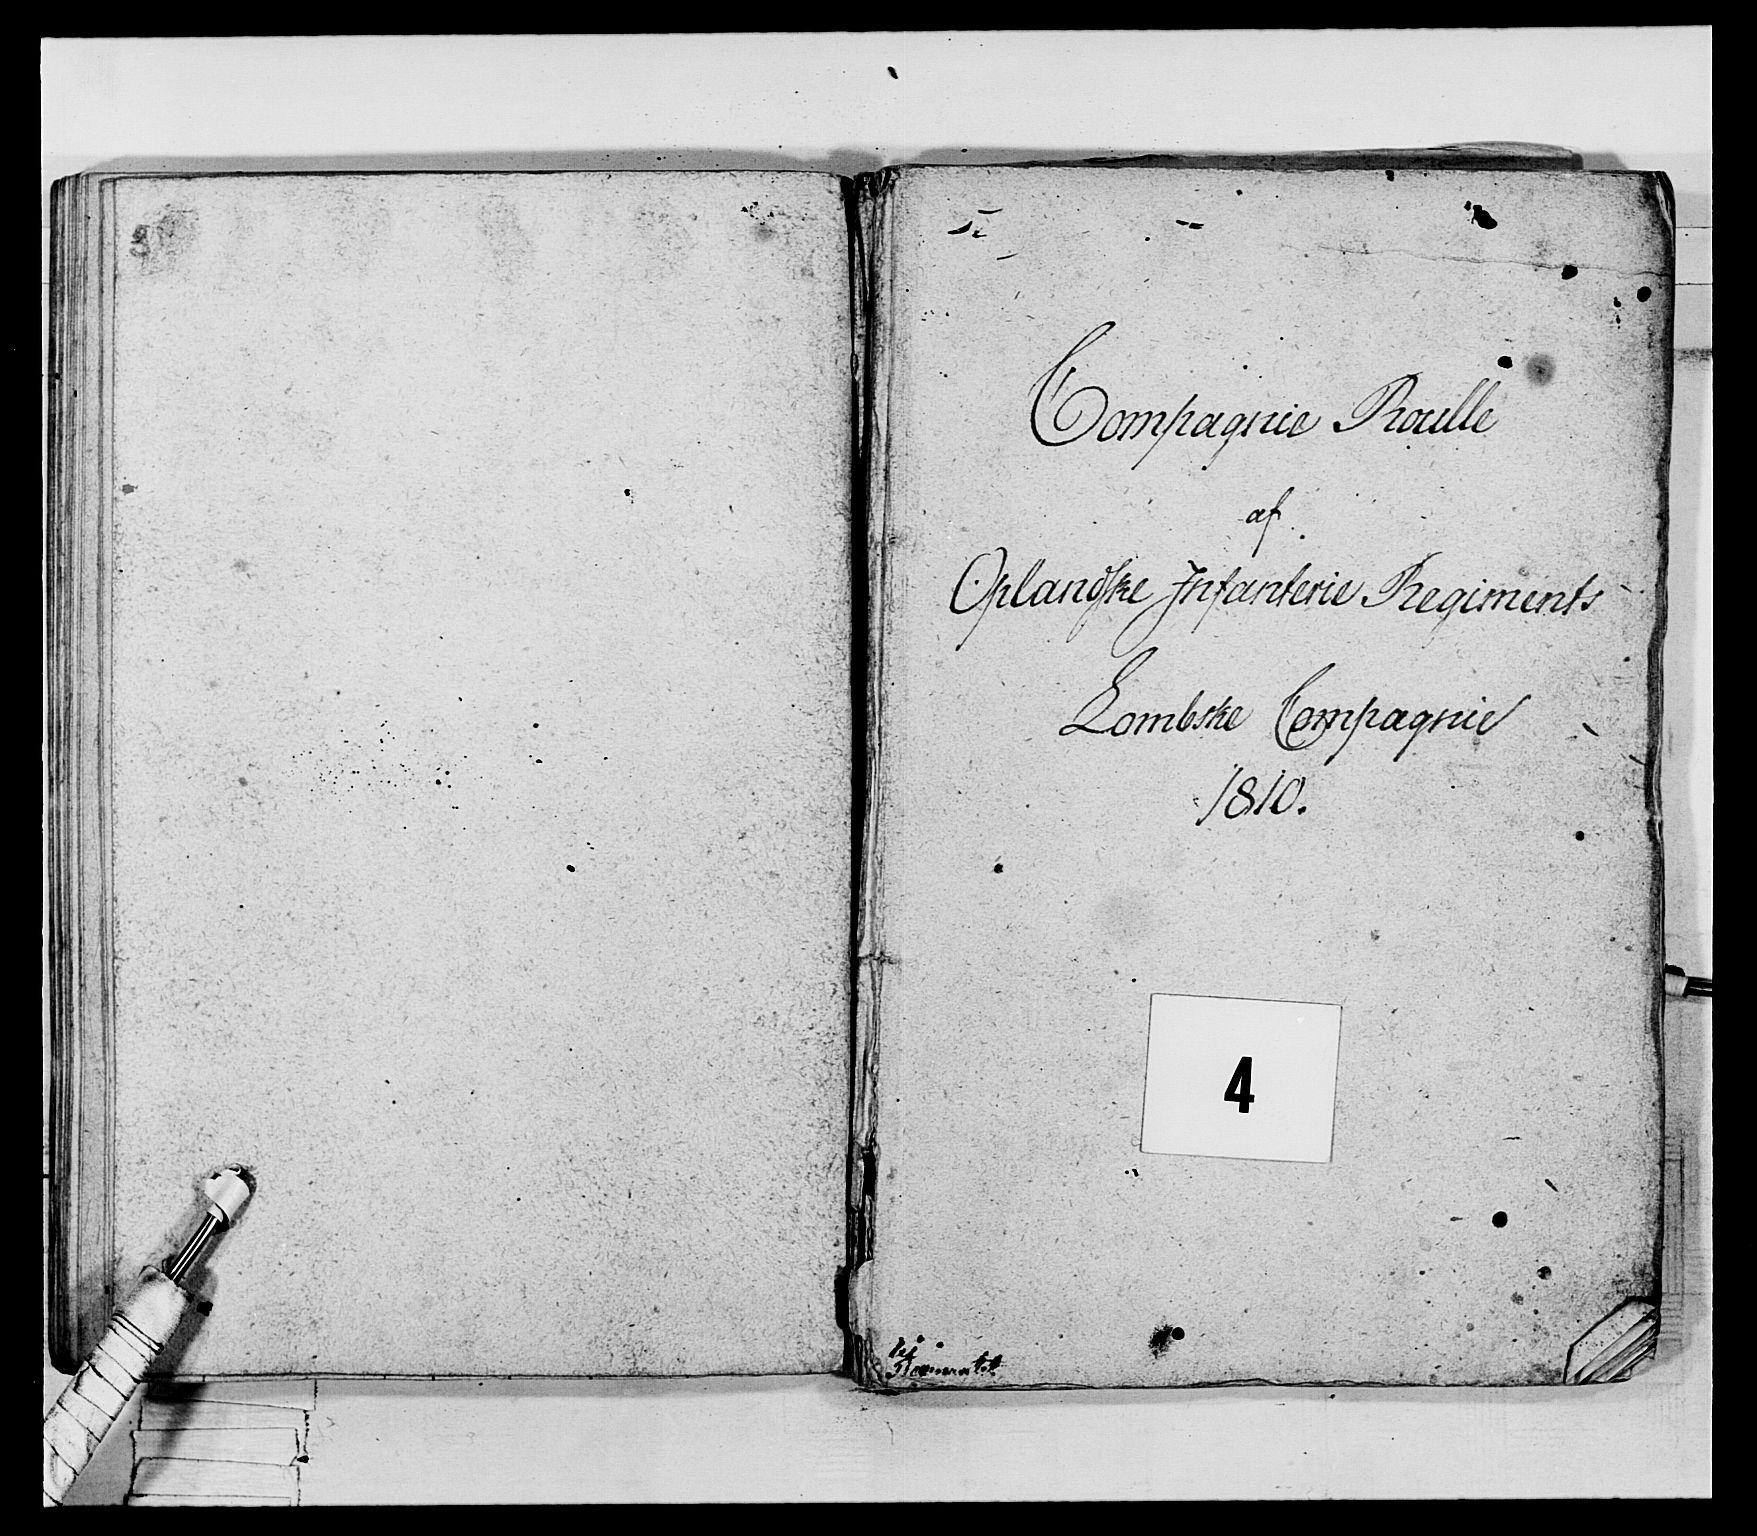 RA, Generalitets- og kommissariatskollegiet, Det kongelige norske kommissariatskollegium, E/Eh/L0069: Opplandske gevorbne infanteriregiment, 1810-1818, s. 160